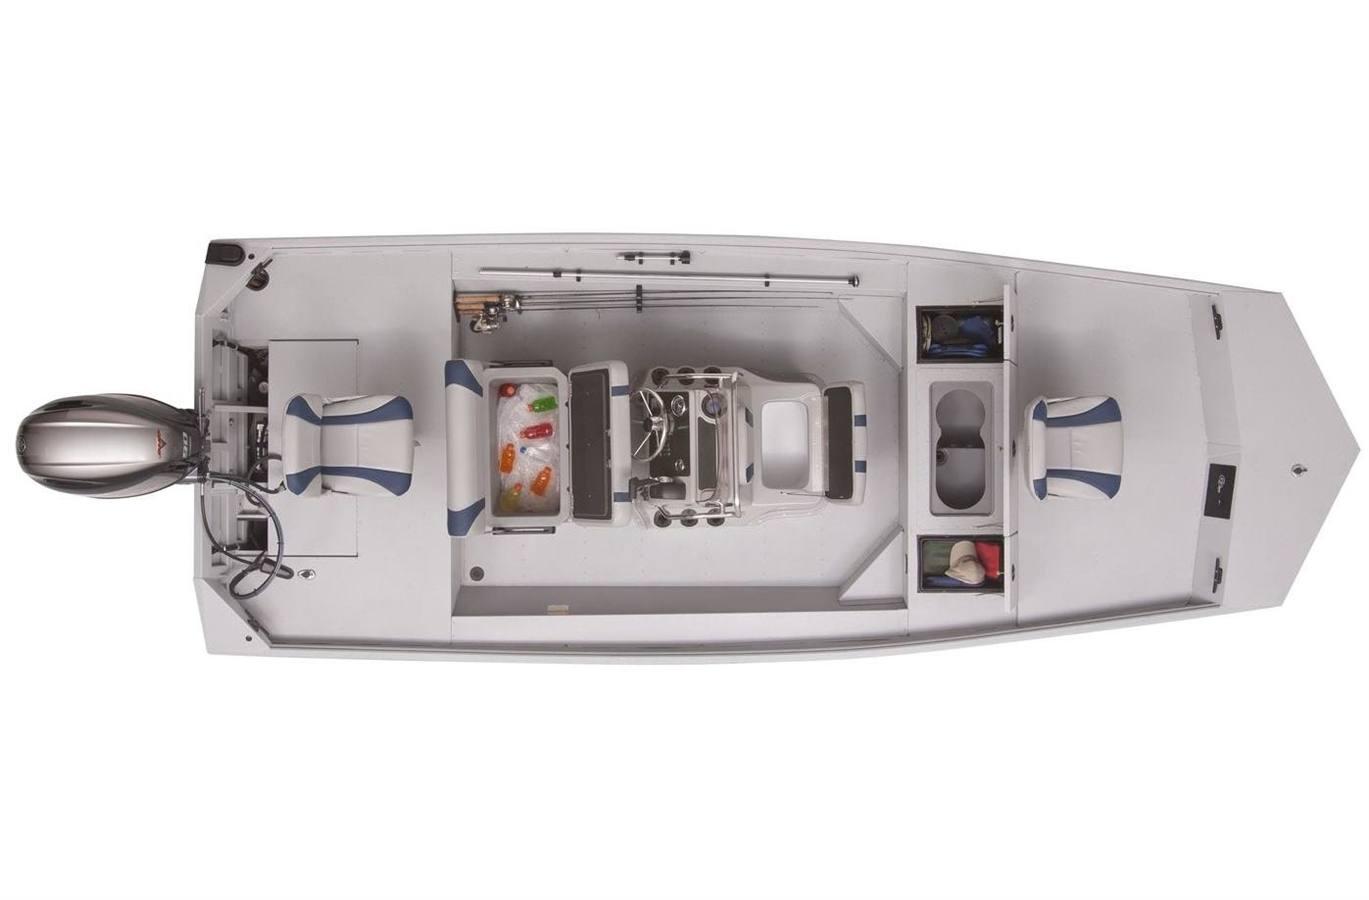 2020 g3 gator tough 18 cct dlx (prop tunnel hull)